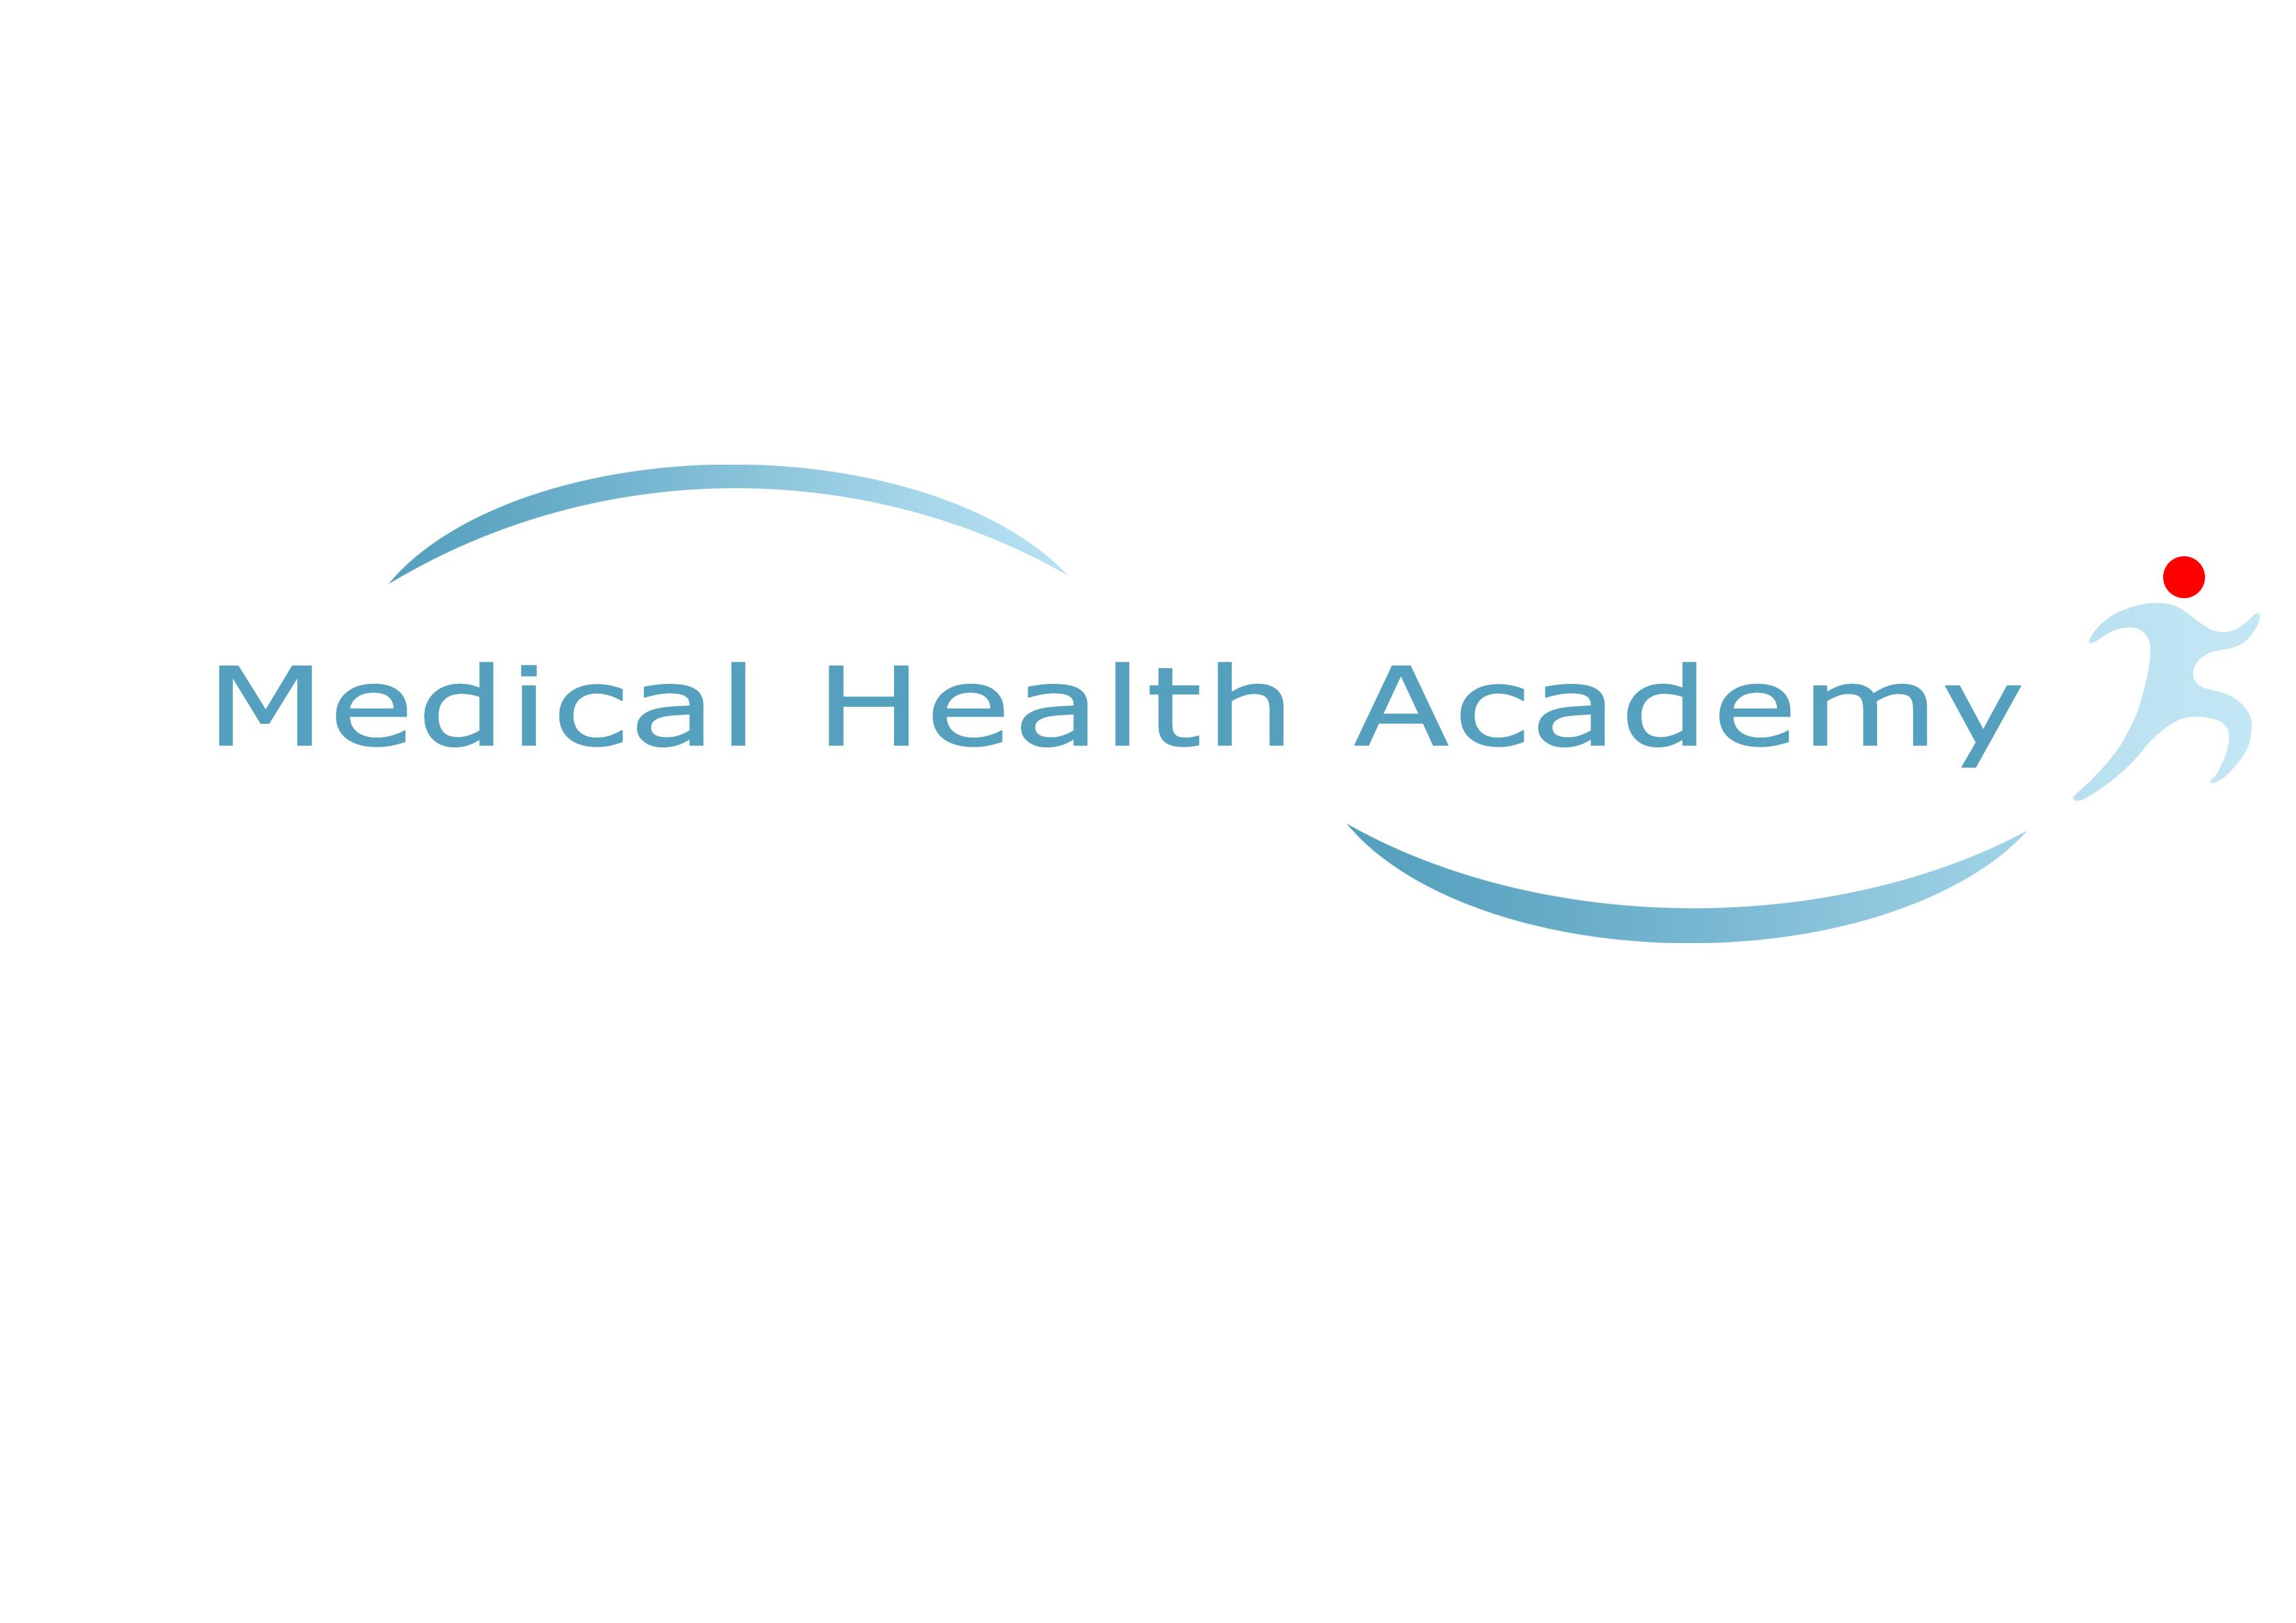 MedicalHealthAcademy Logo